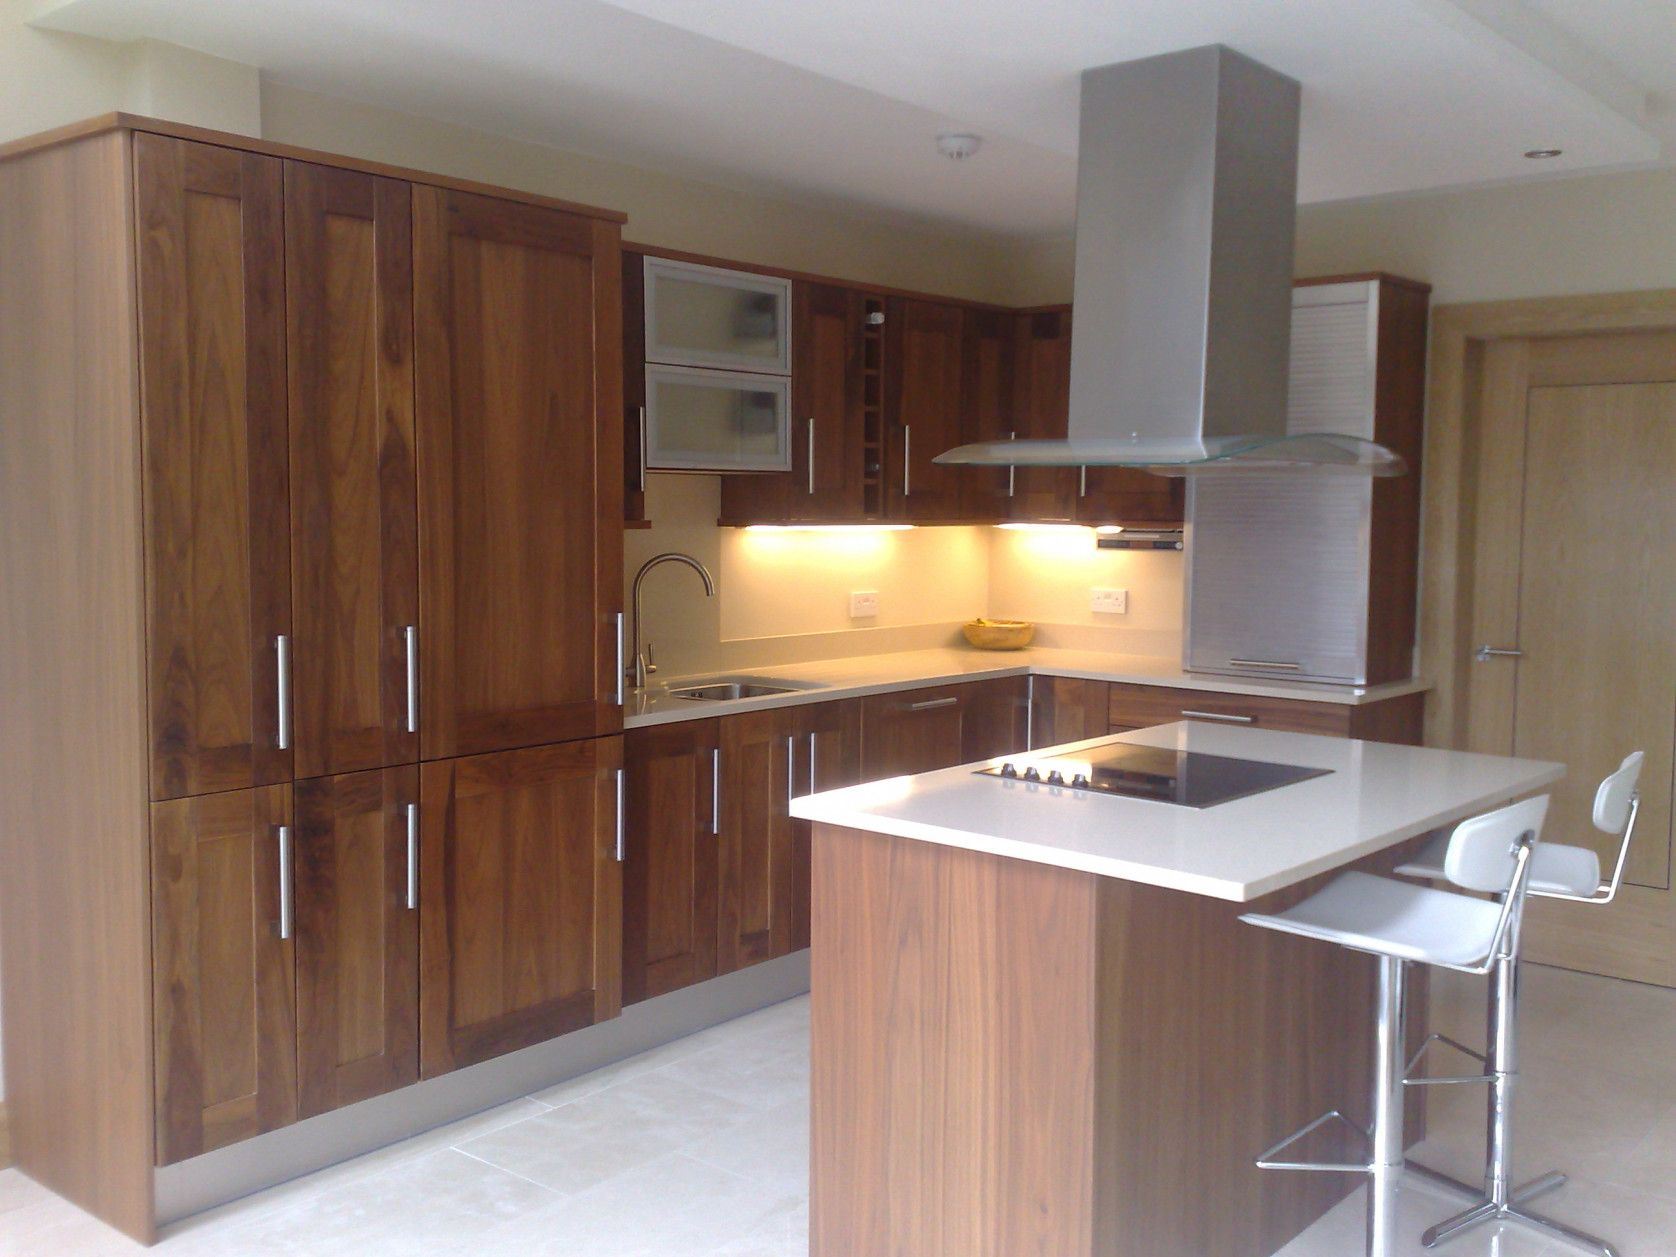 50 Solid Walnut Kitchen Cabinets Kitchen Cabinets Storage Ideas Check More At Http Ww Walnut Kitchen Shaker Style Kitchen Cabinets Walnut Kitchen Cabinets